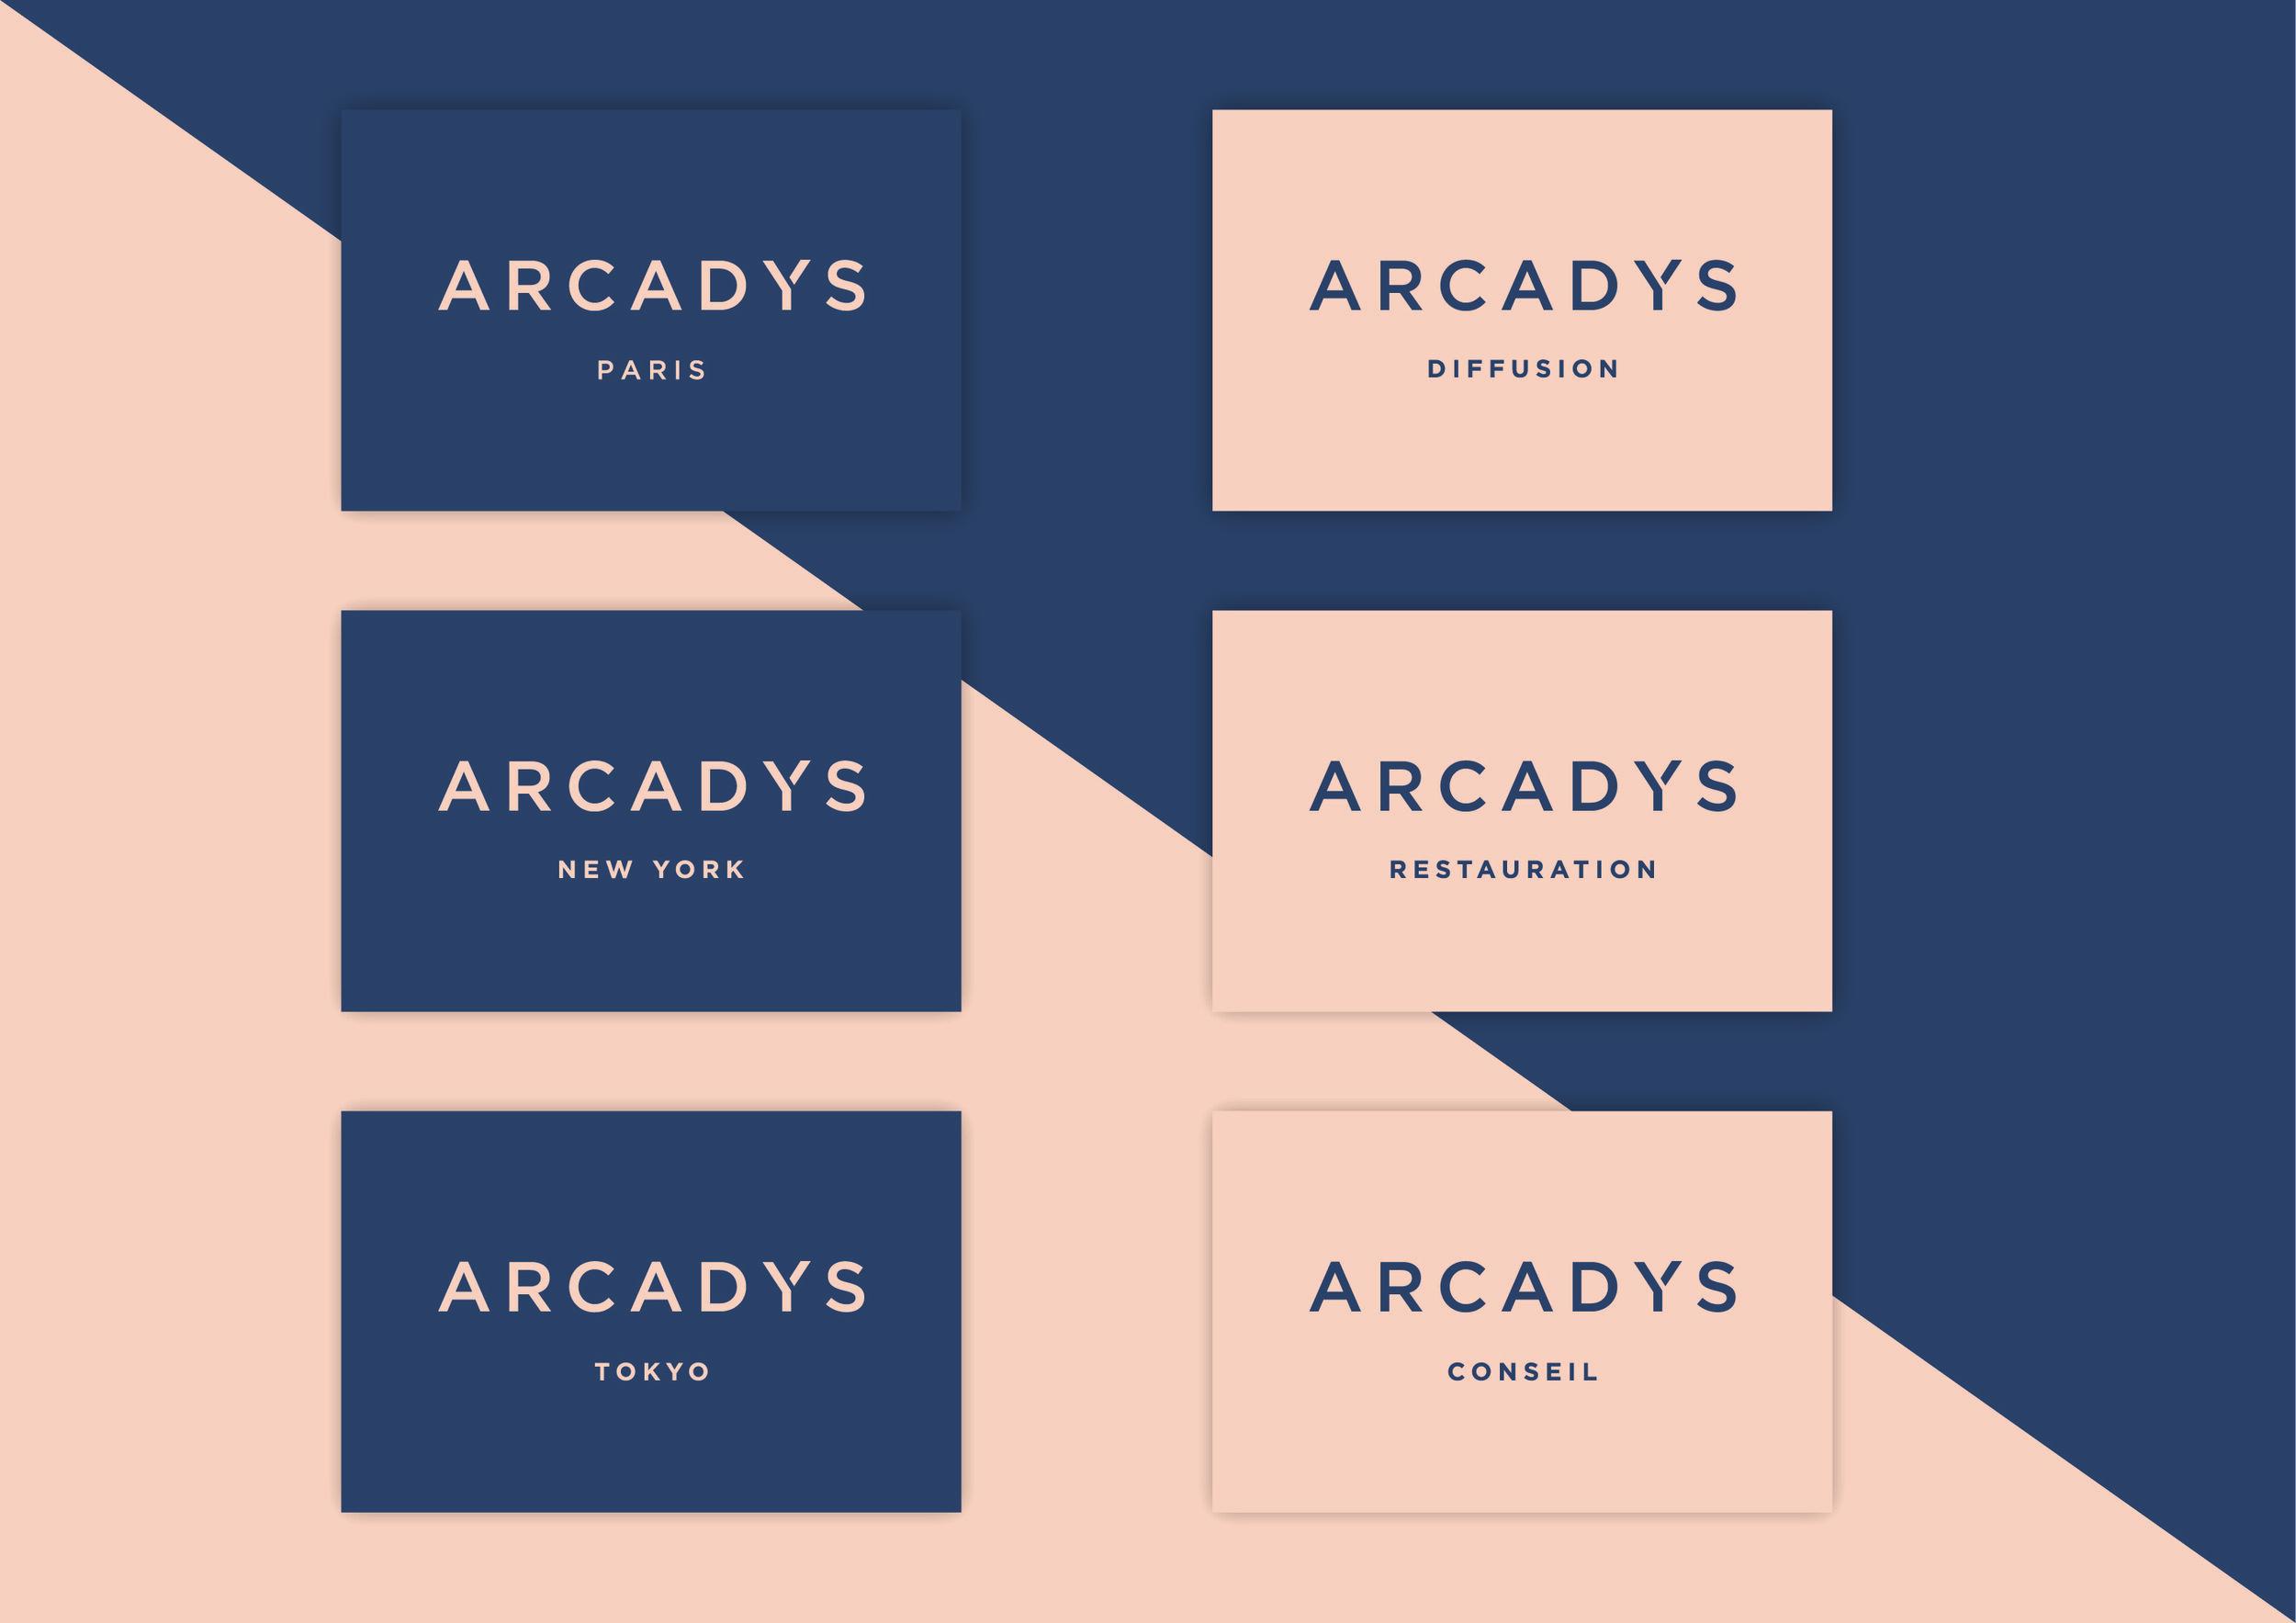 Plan De Travail 15 arcadys — stereochromie studio